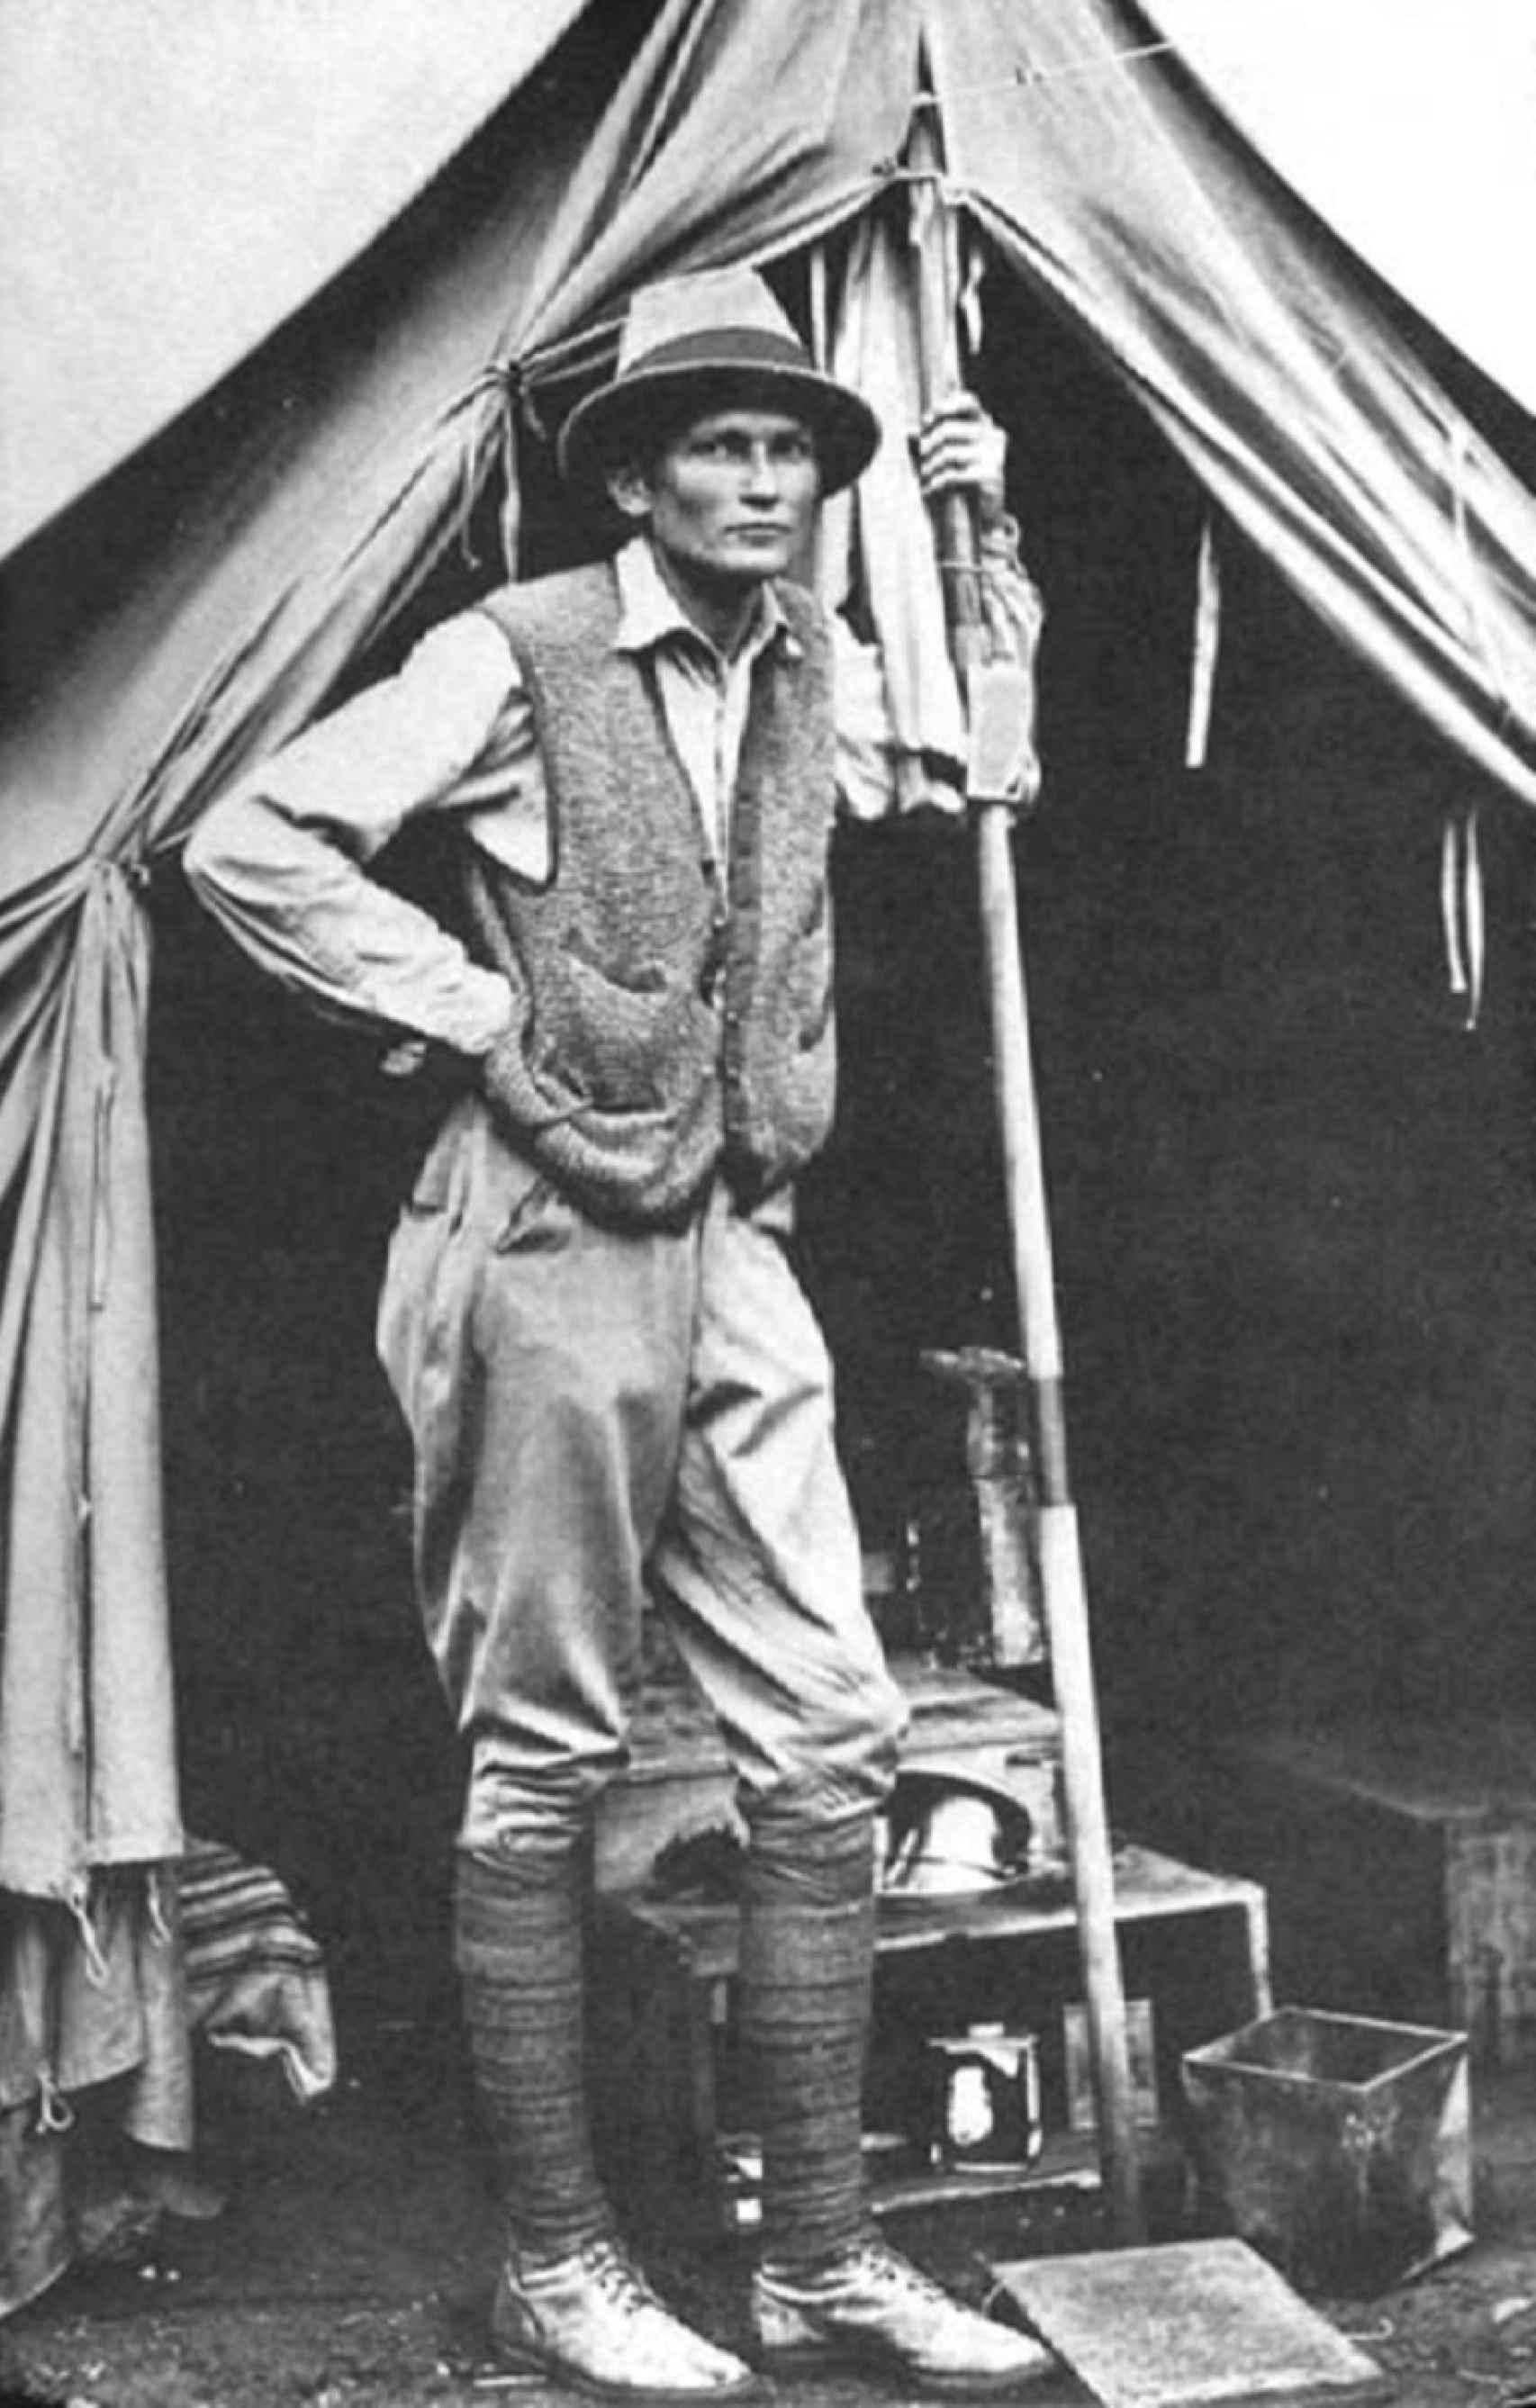 Hiram Bingham III en Machu Picchu en 1912.